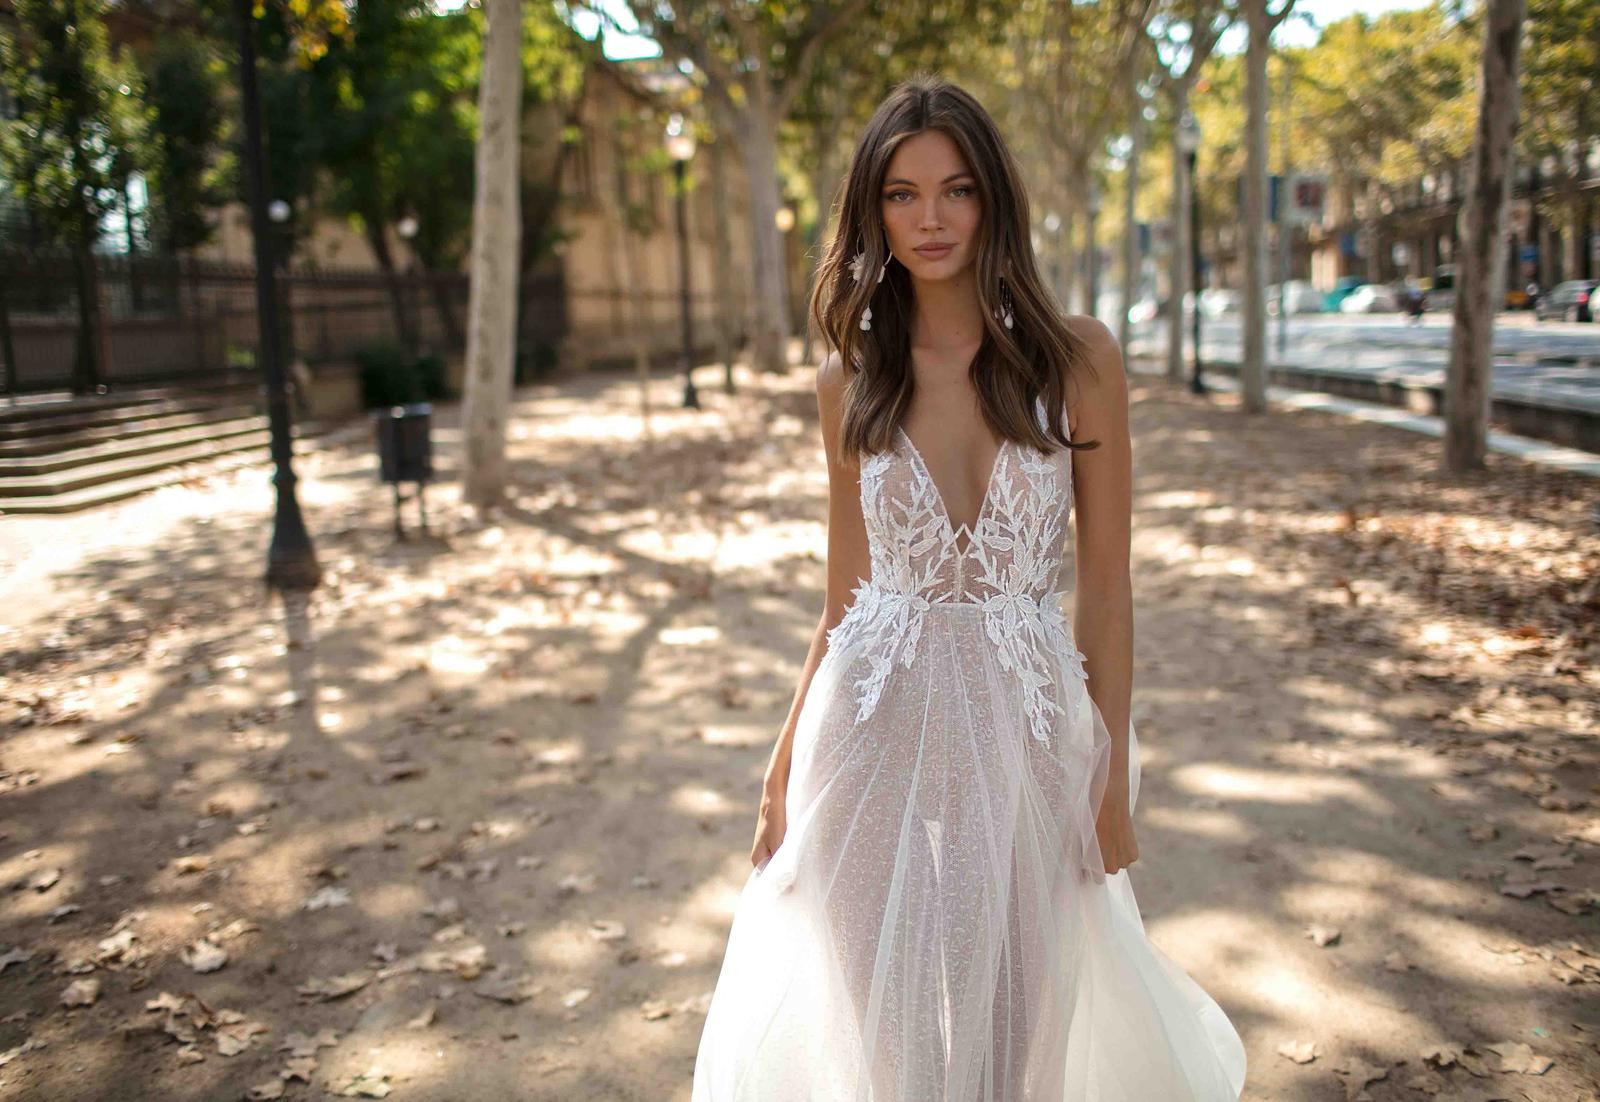 Muse by Berta * Svadobné šaty z kolekcií na rok 2019 - Obrázok č. 36